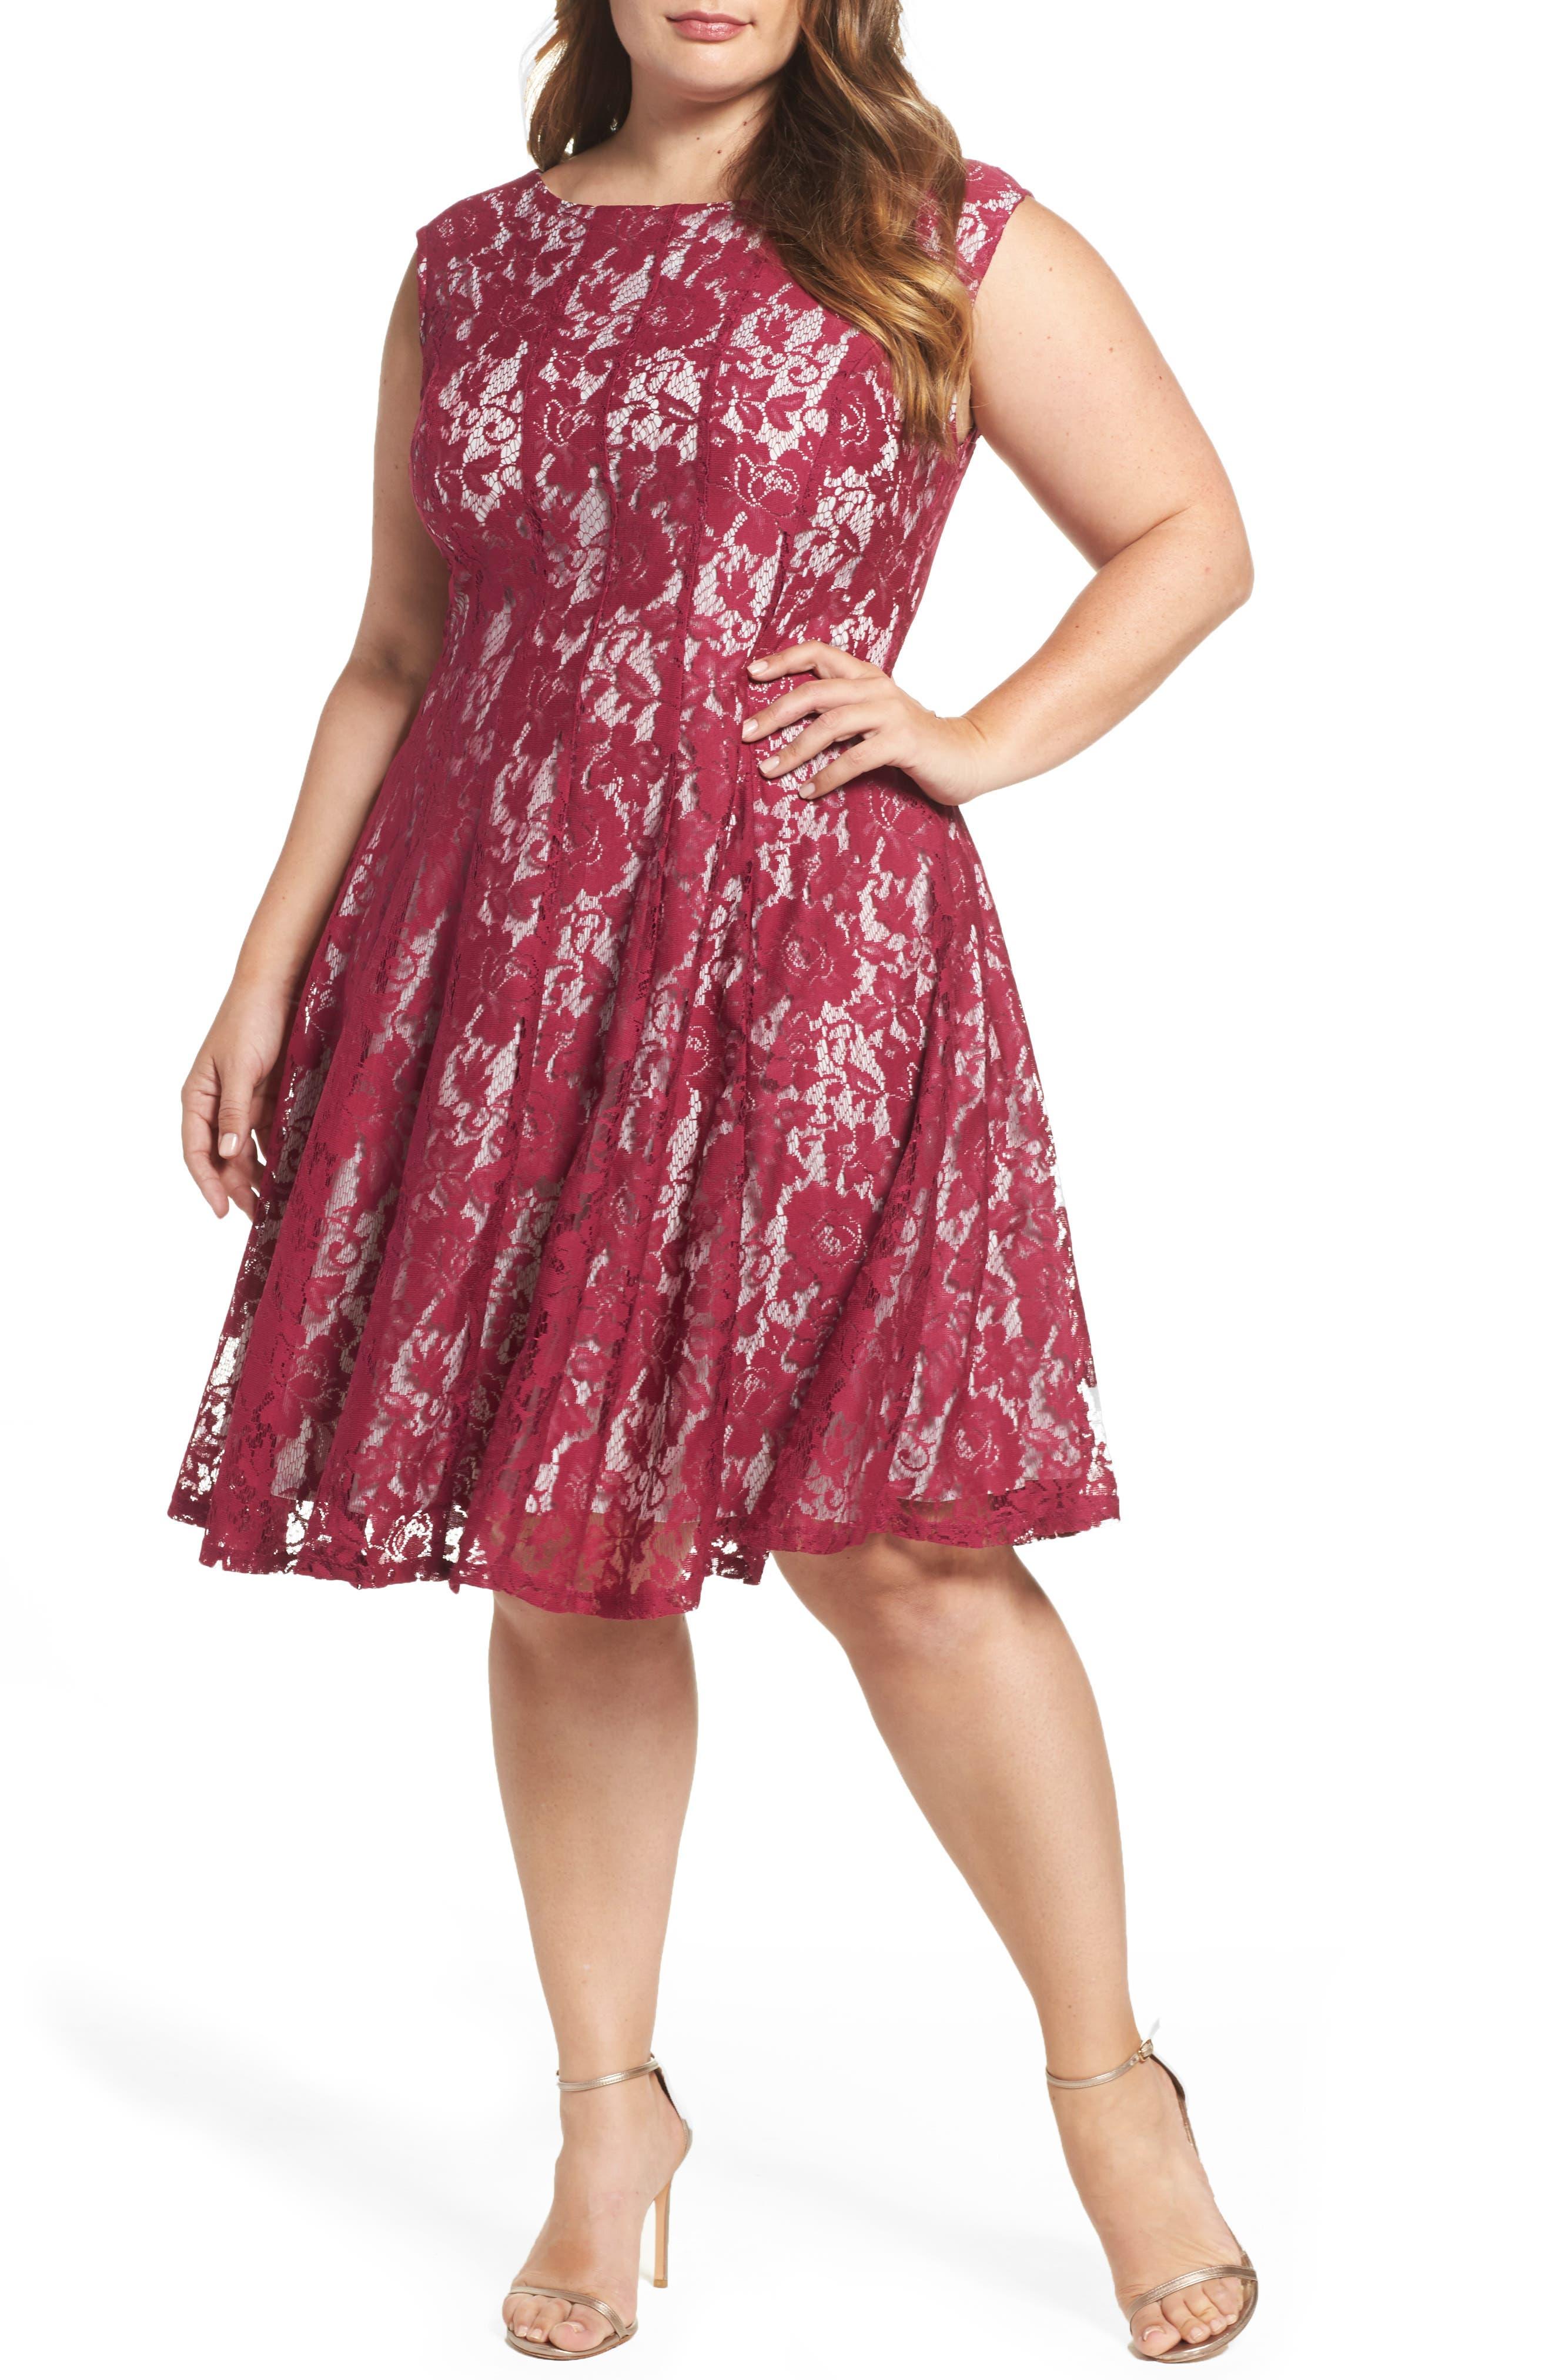 Gabby Skye Lace Fit & Flare Dress (Plus Size)